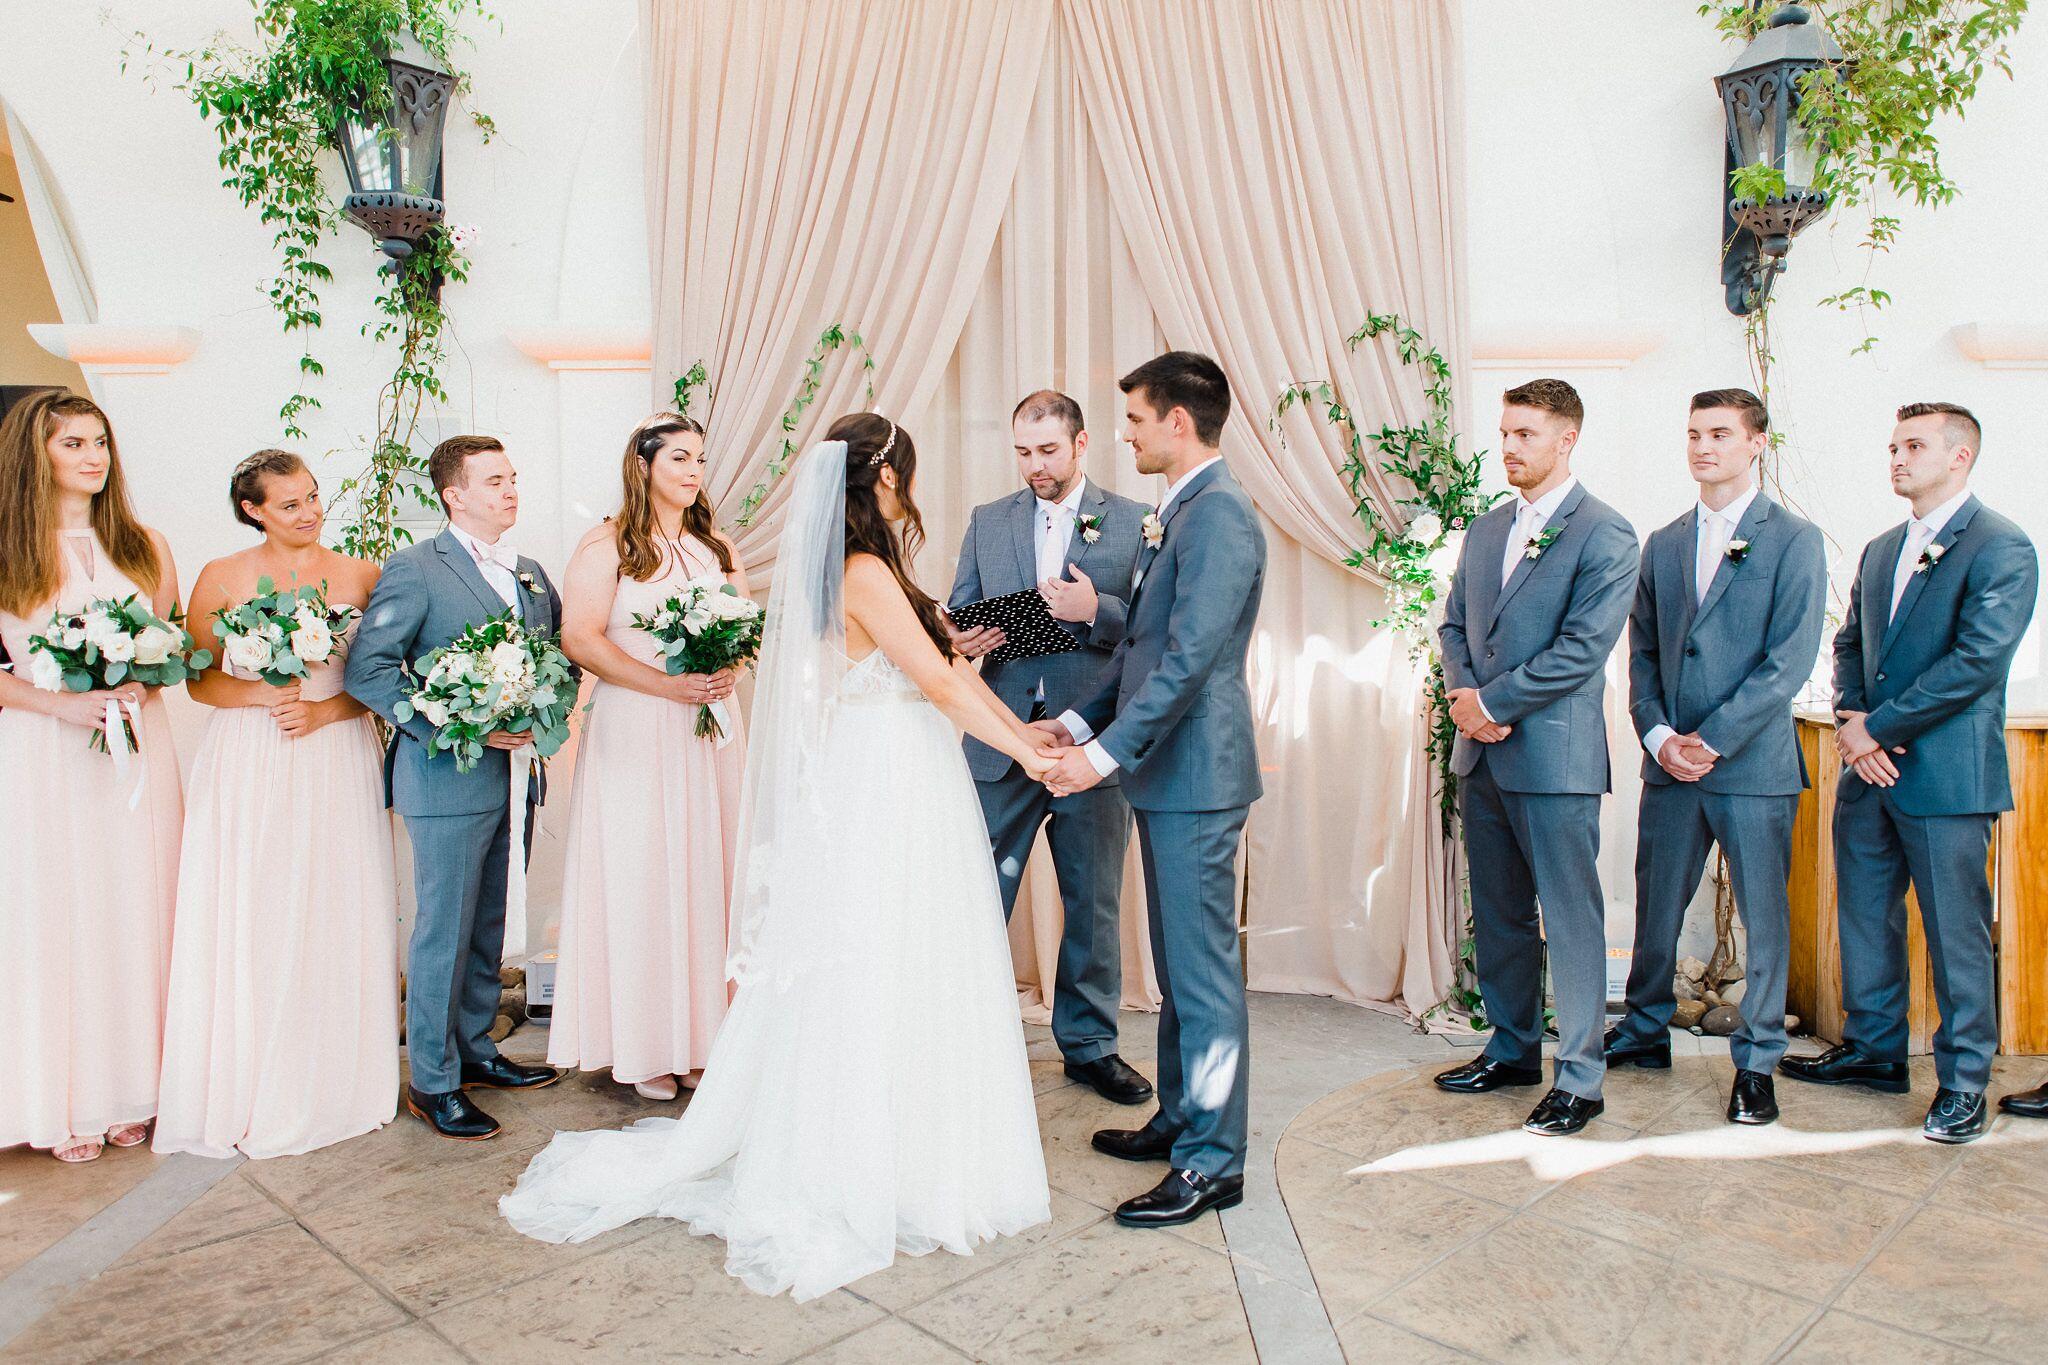 www.santabarbaraweddings.com | Photographer: Grace Kathryn | Venues: Villa & Vine, Santa Barbara Courthouse, Hilton Santa Barbara Resort | Coordination: Burlap & Bordeaux | Wedding Vows